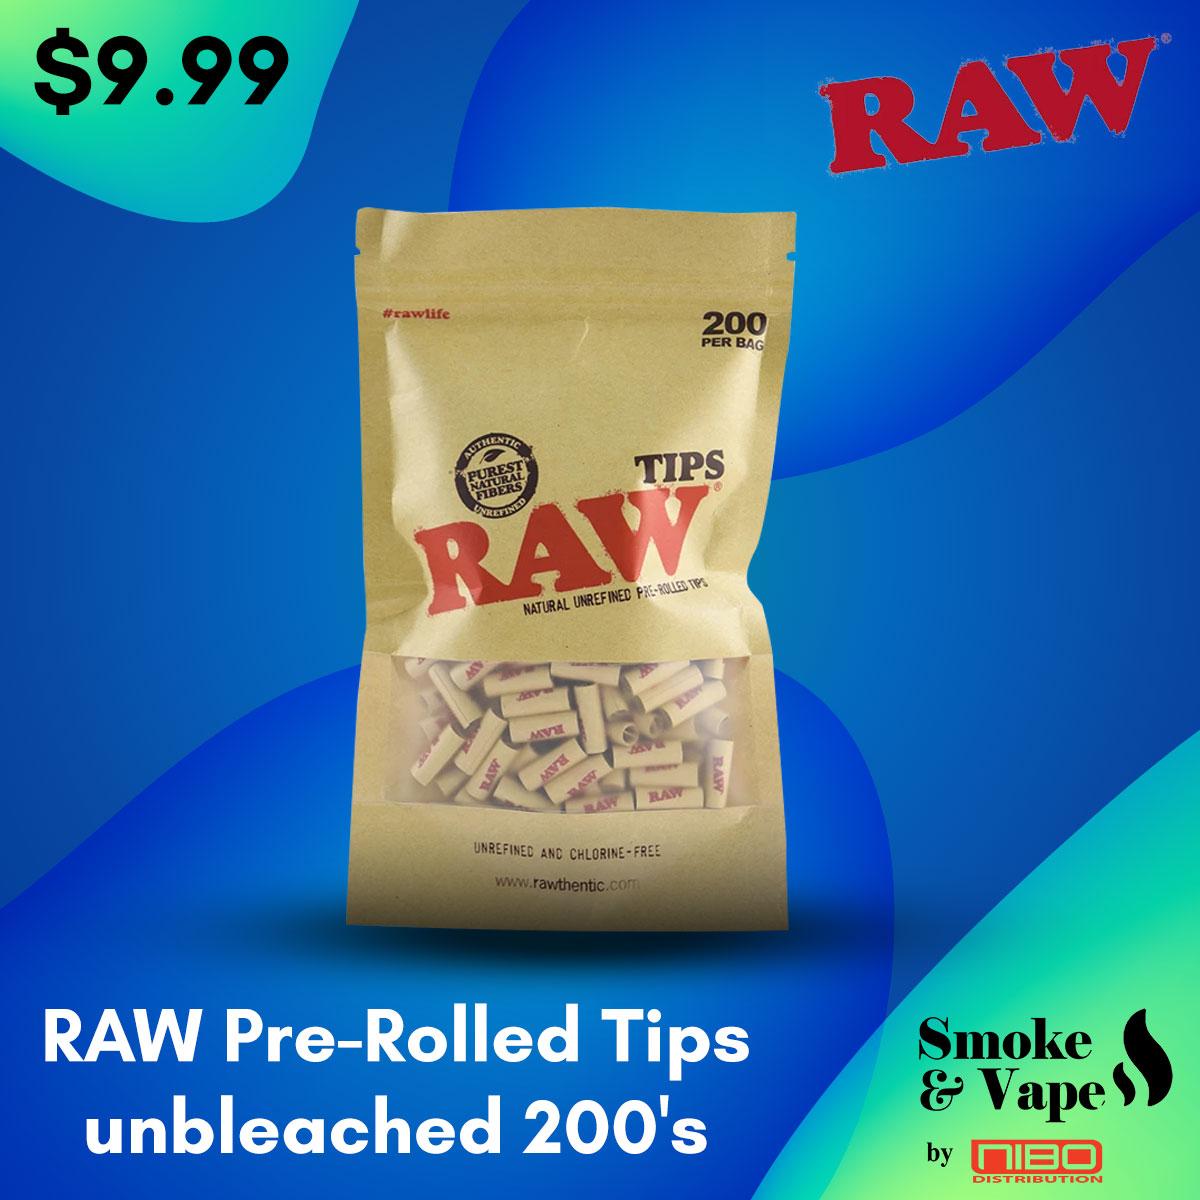 RAW Pre-Rolled Tips unbleached 200's  https://t.co/mLzavAMmvi  #prerolledraw #RawTubes #raw_rolling #tray #rawtray #smokeVape #smoking_accessory #rawtraymini #mini #mini_tray #canada #smoking #vaping #smokefans #vape #toronto_smoke_accessory https://t.co/ZOm9TzIAqM